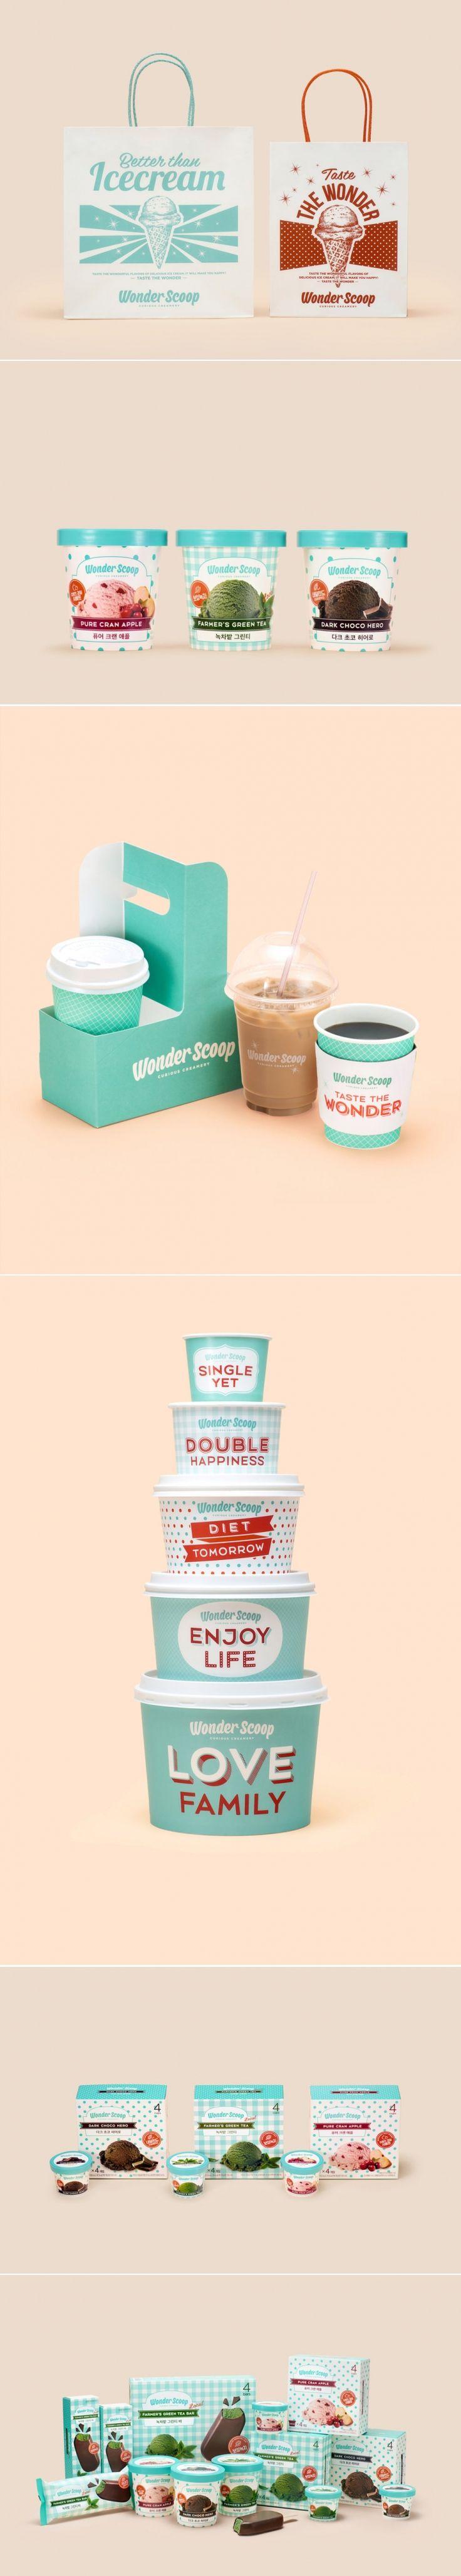 Vintage Inspiration + Sassy Phrases = One Adorable Ice Cream Brand — The Dieline | Packaging & Branding Design & Innovation News